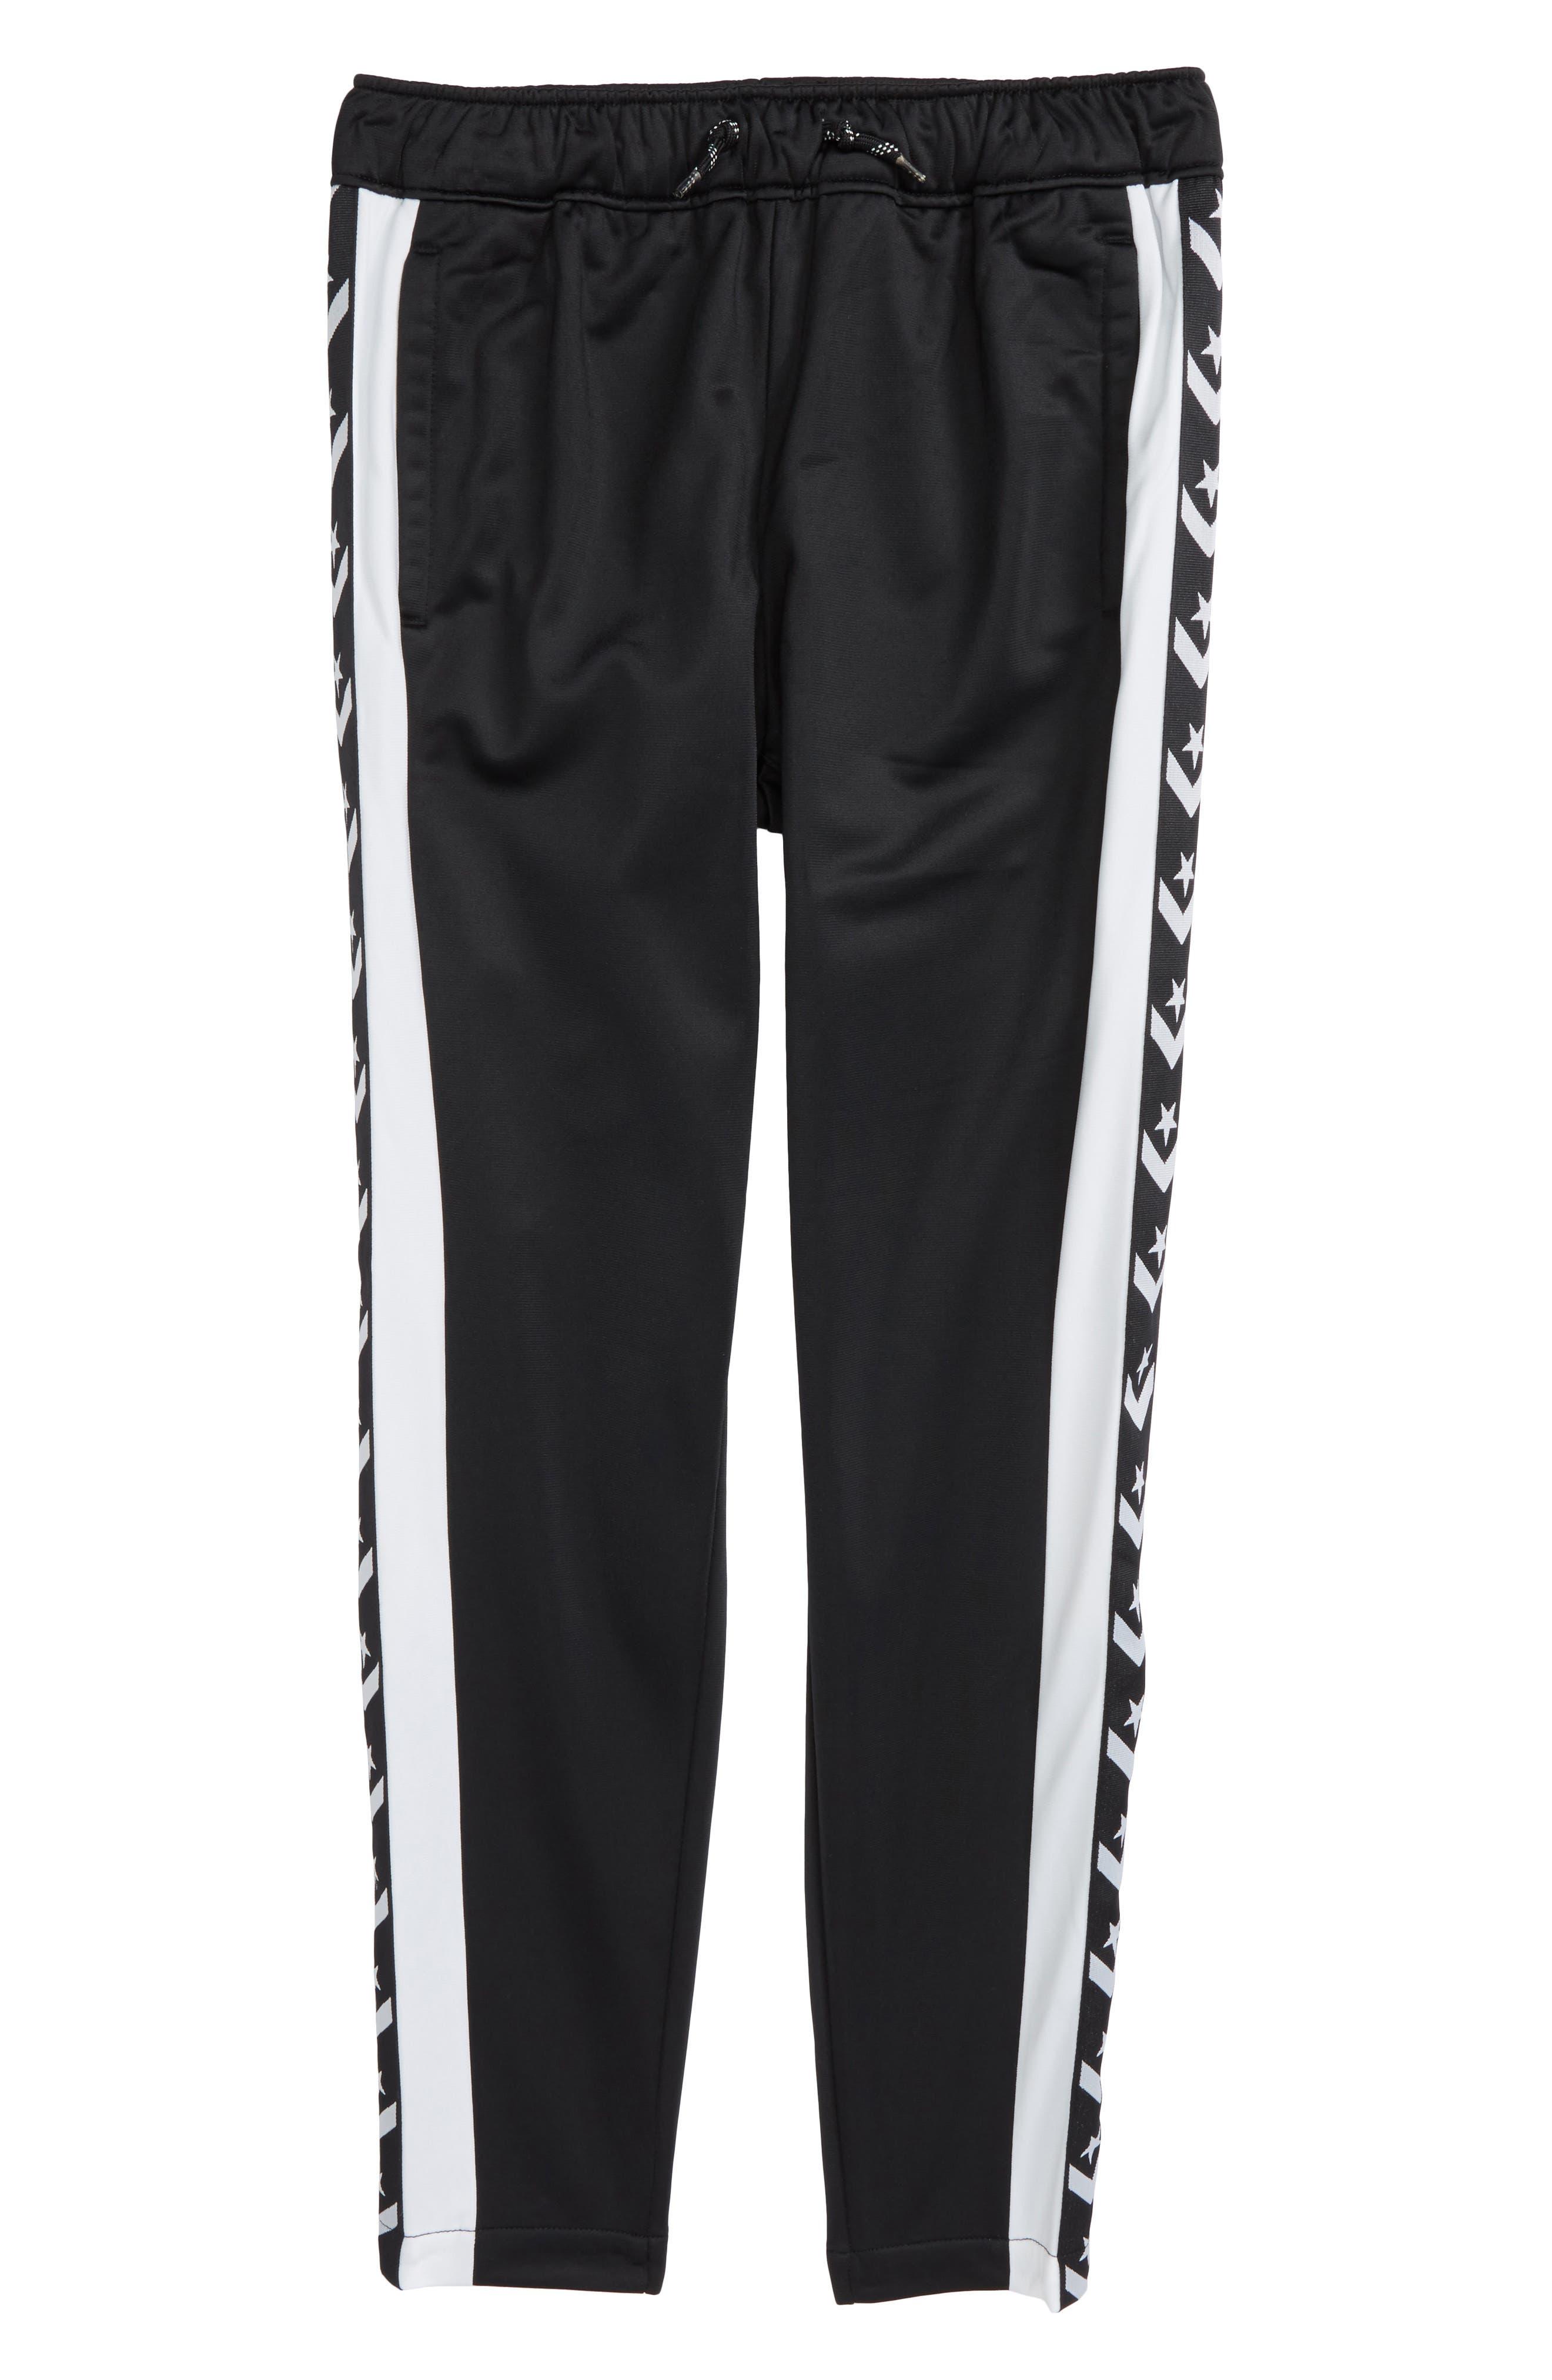 Heritage Snap Leg Warm-Up Pants,                             Main thumbnail 1, color,                             Black